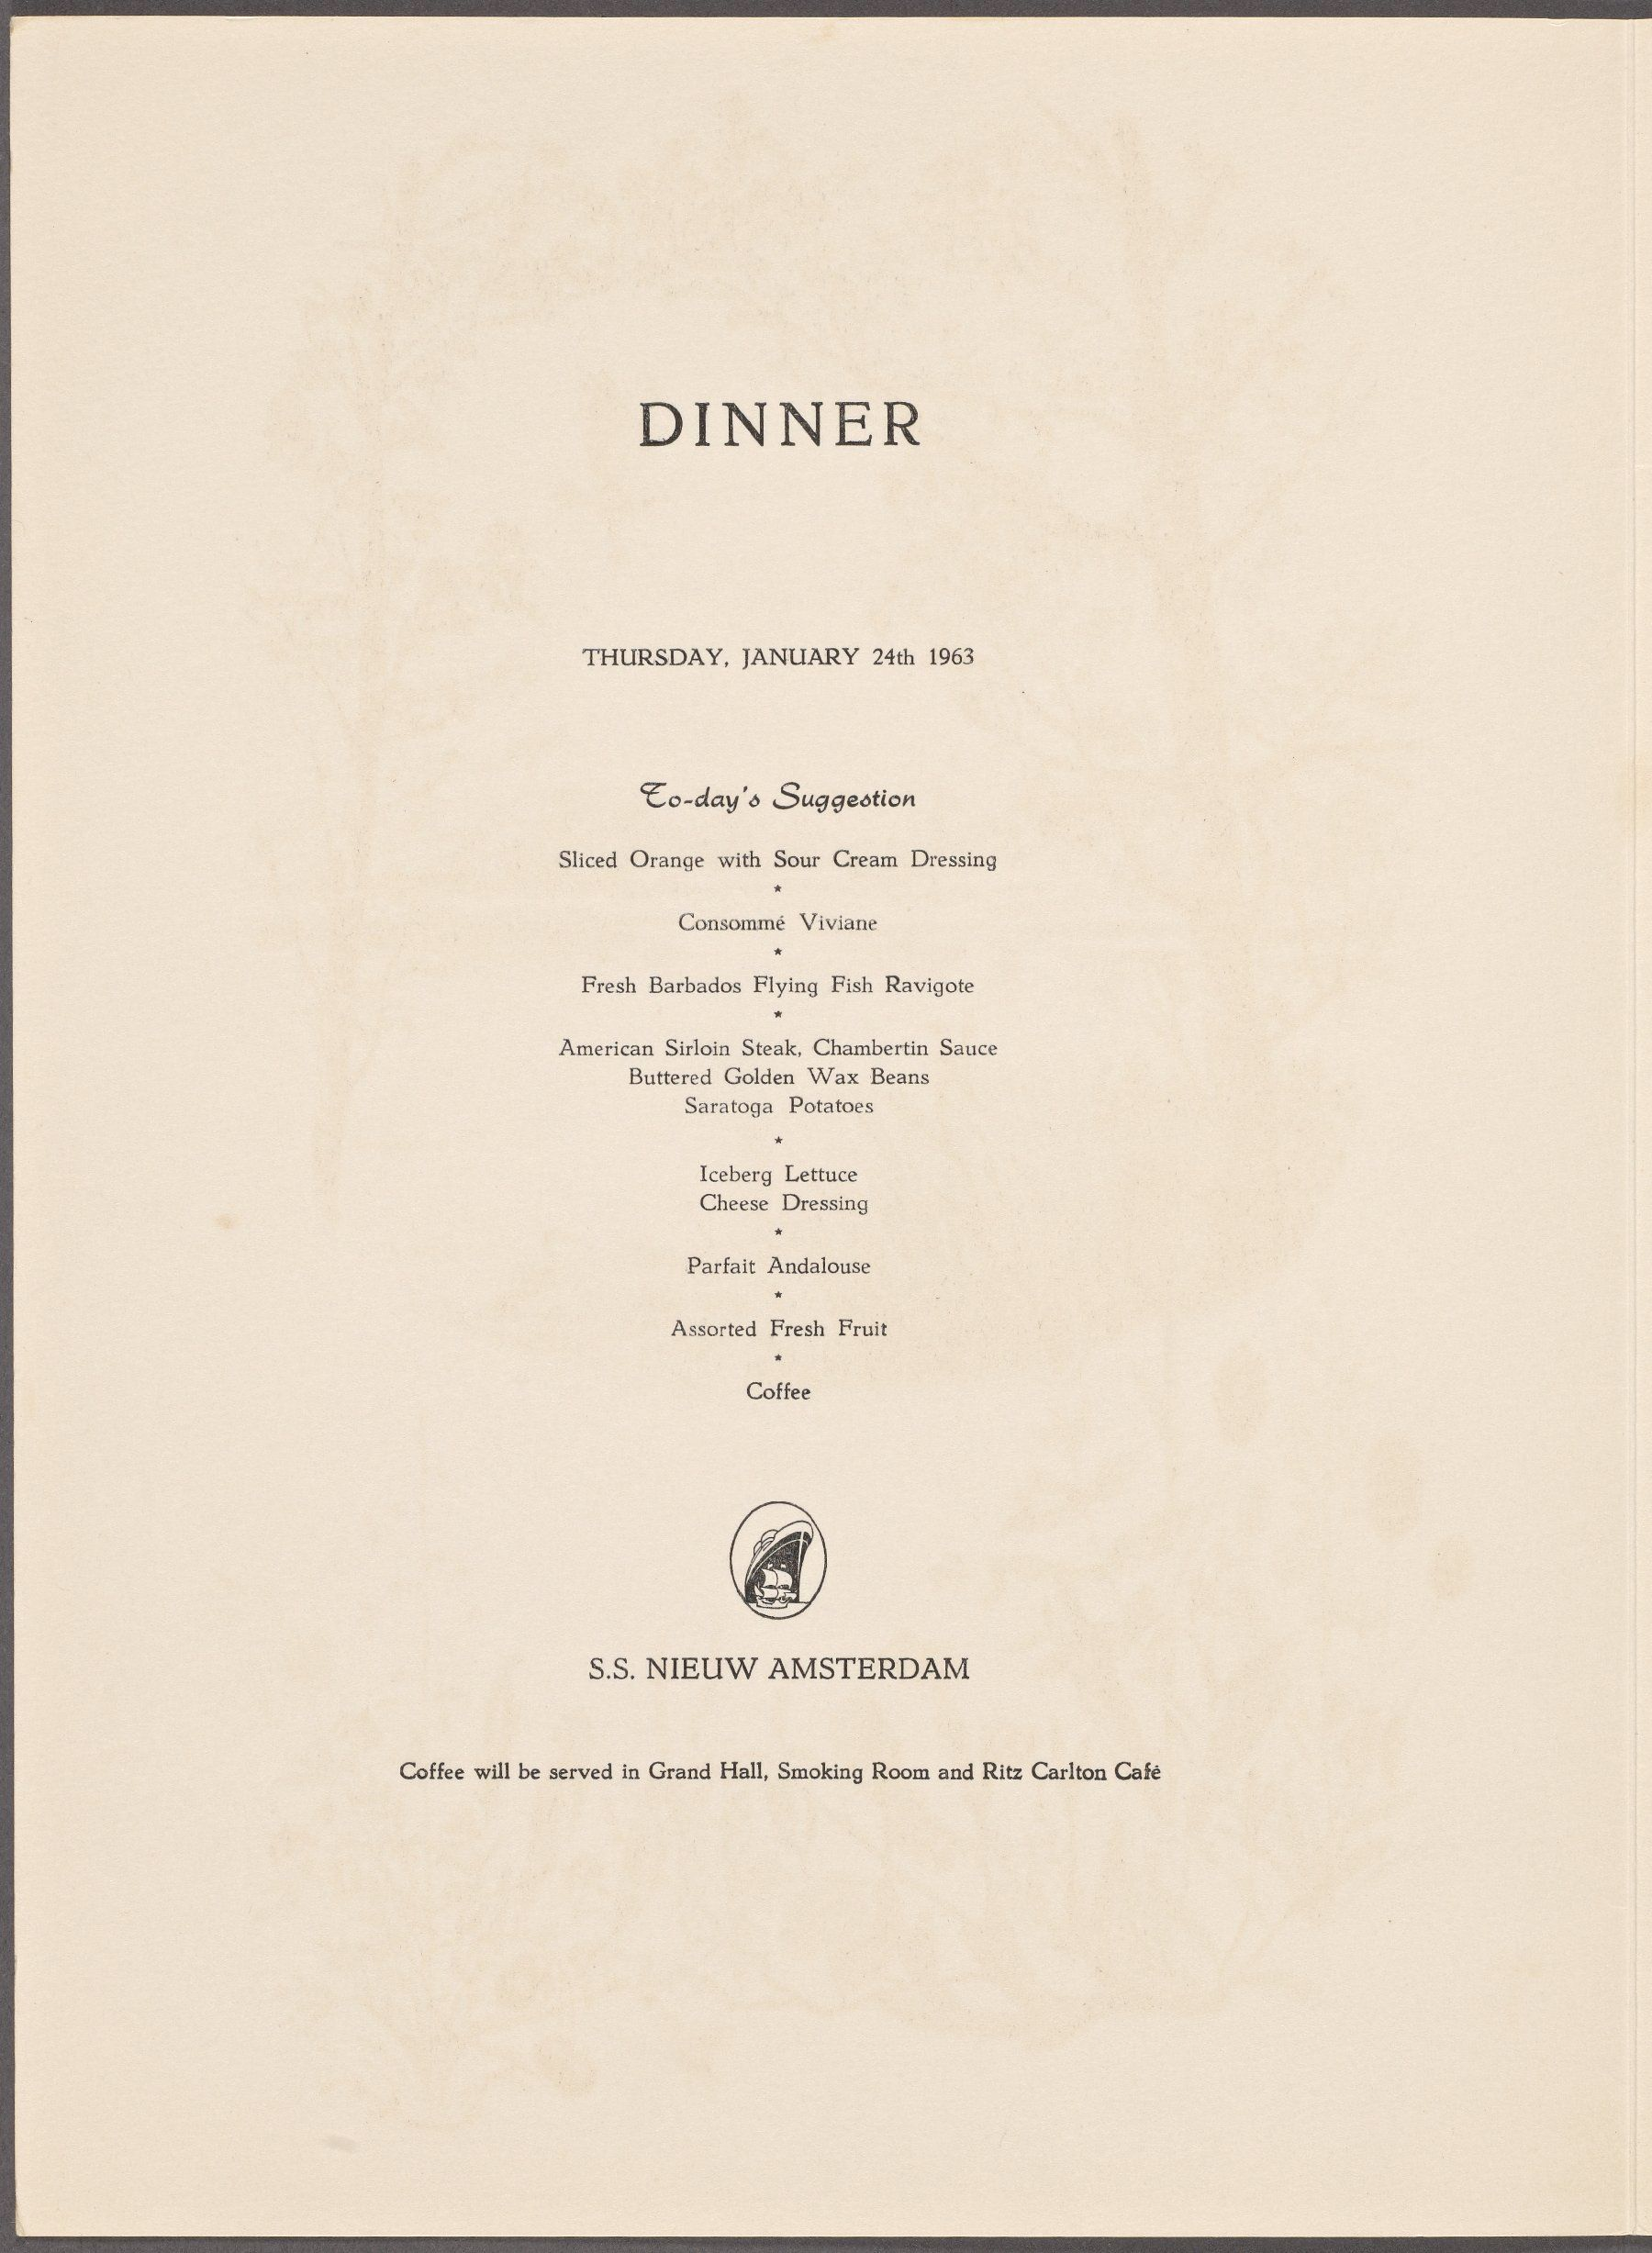 Ss nieuw amsterdam january 24 1963 menus pinterest menu and ss nieuw amsterdam january 24 1963 publicscrutiny Image collections